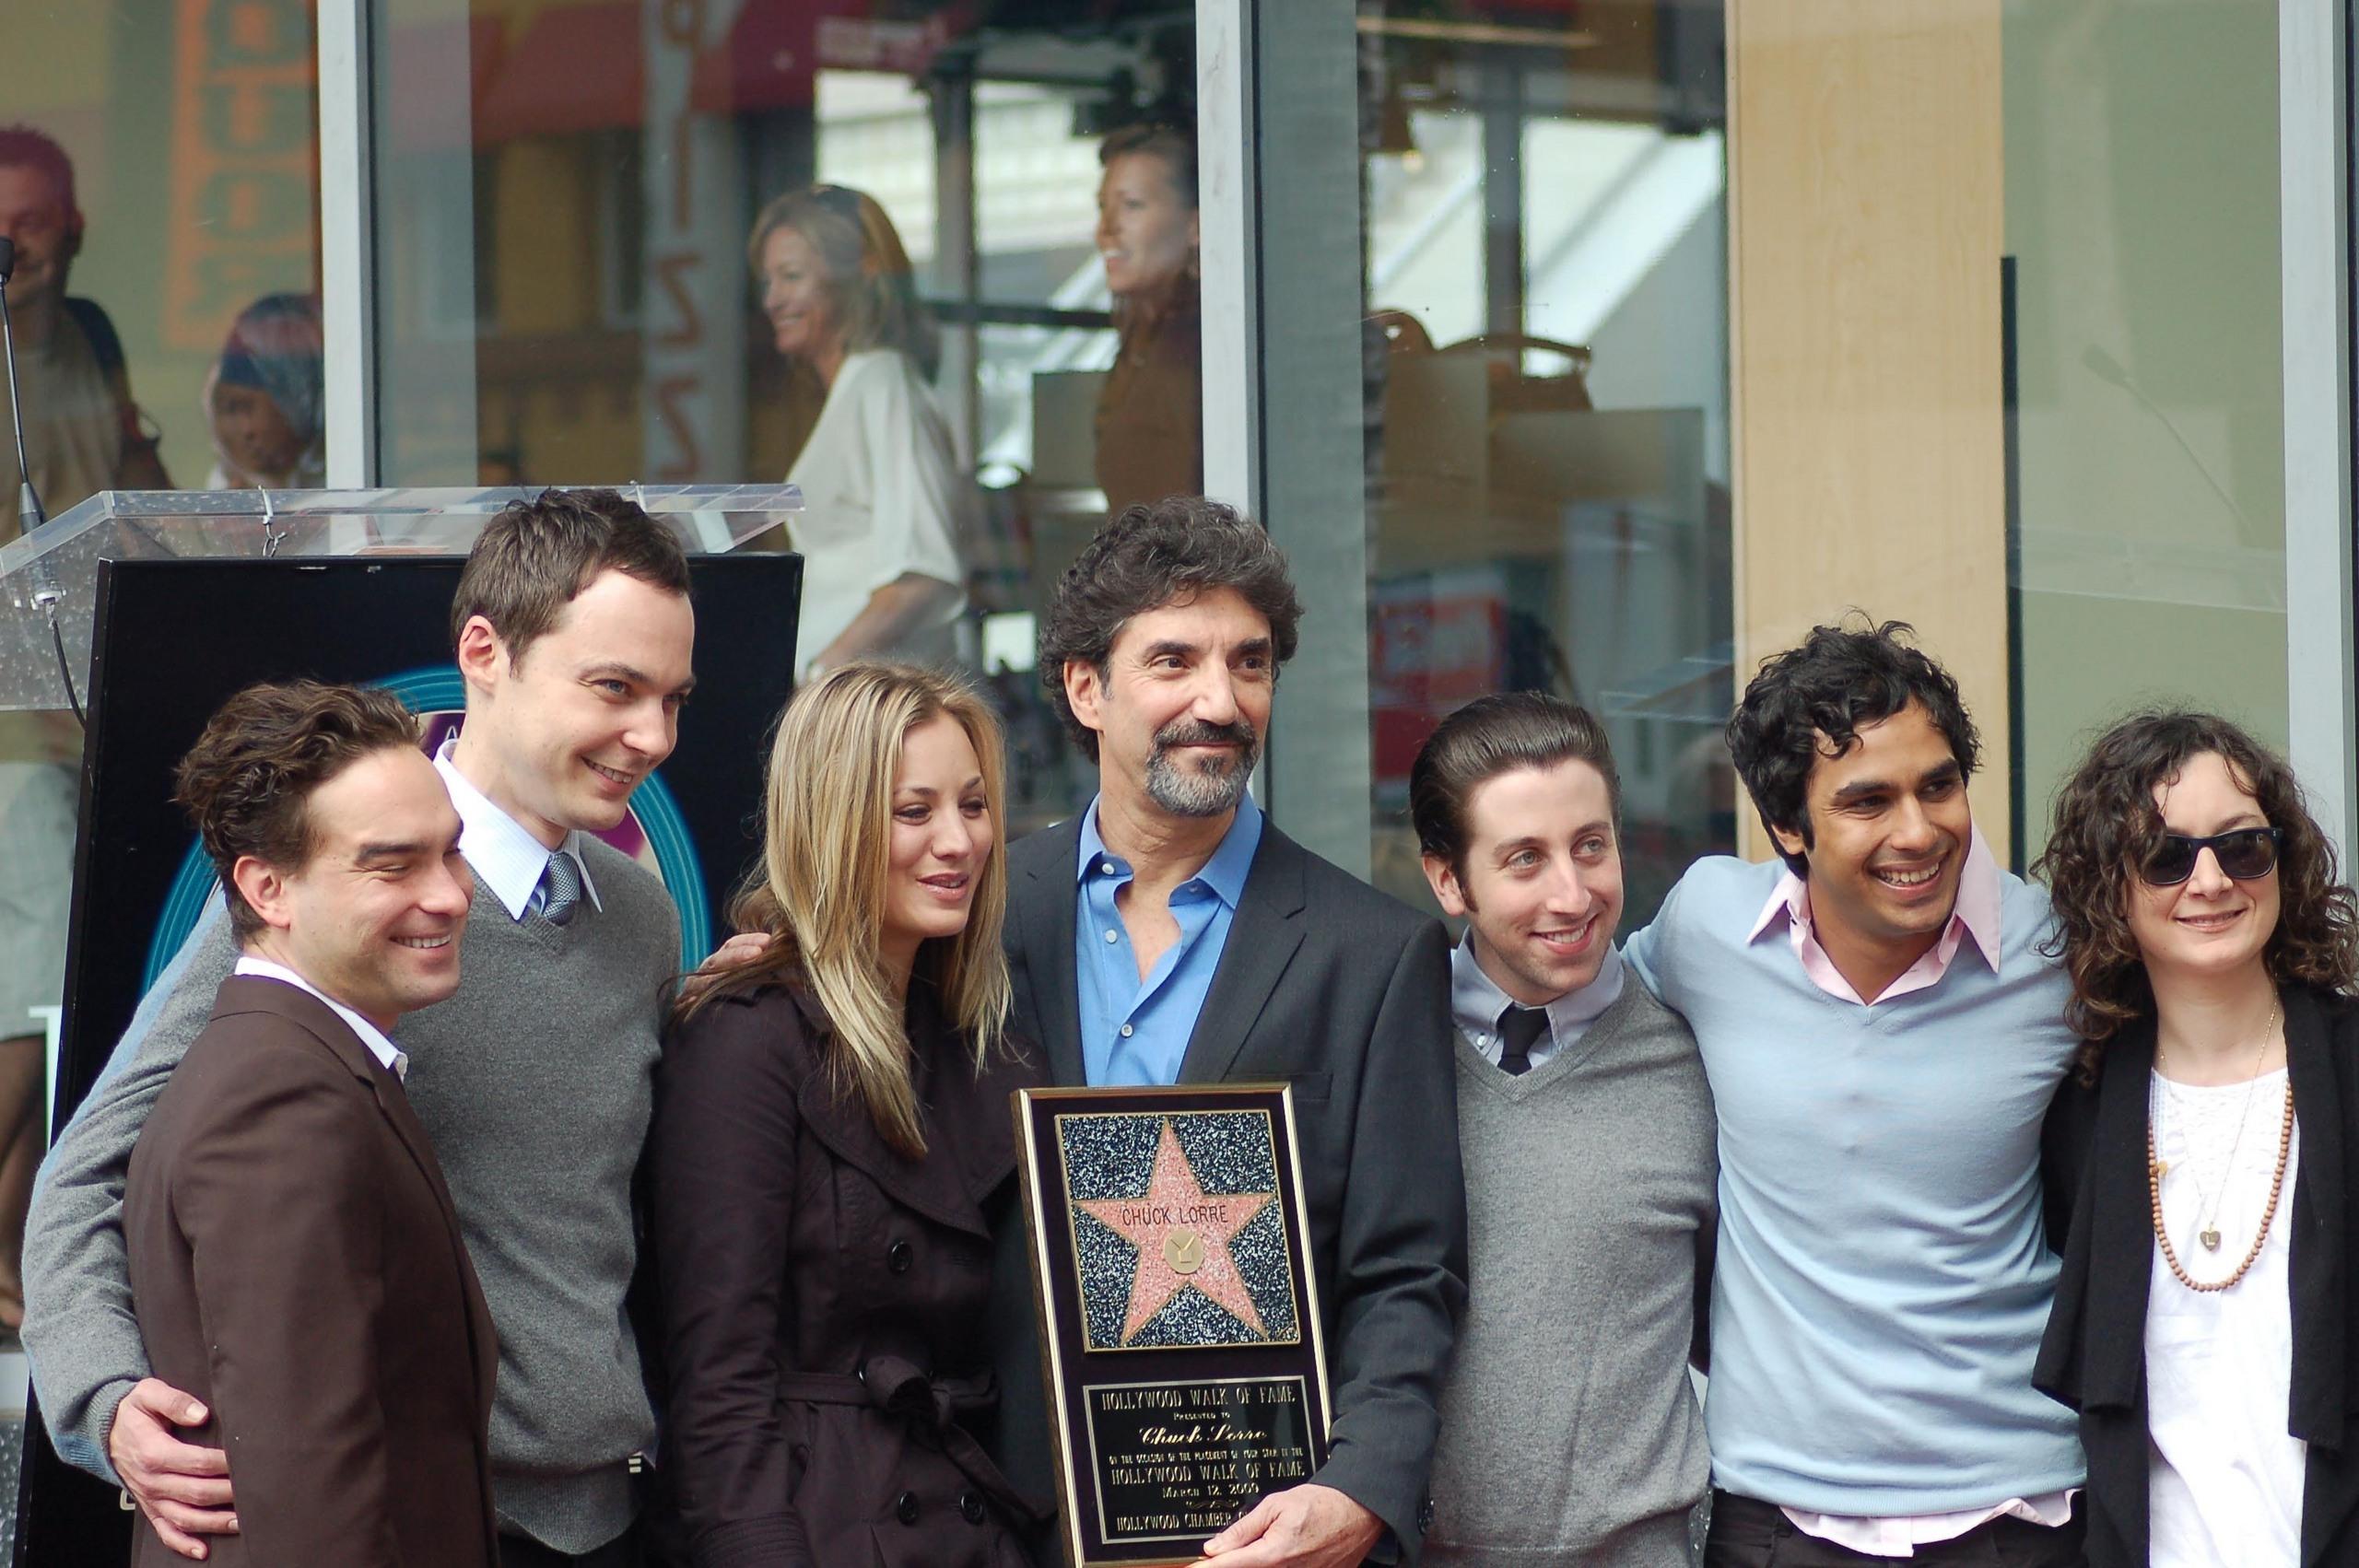 Image search: The Big Bang Theory